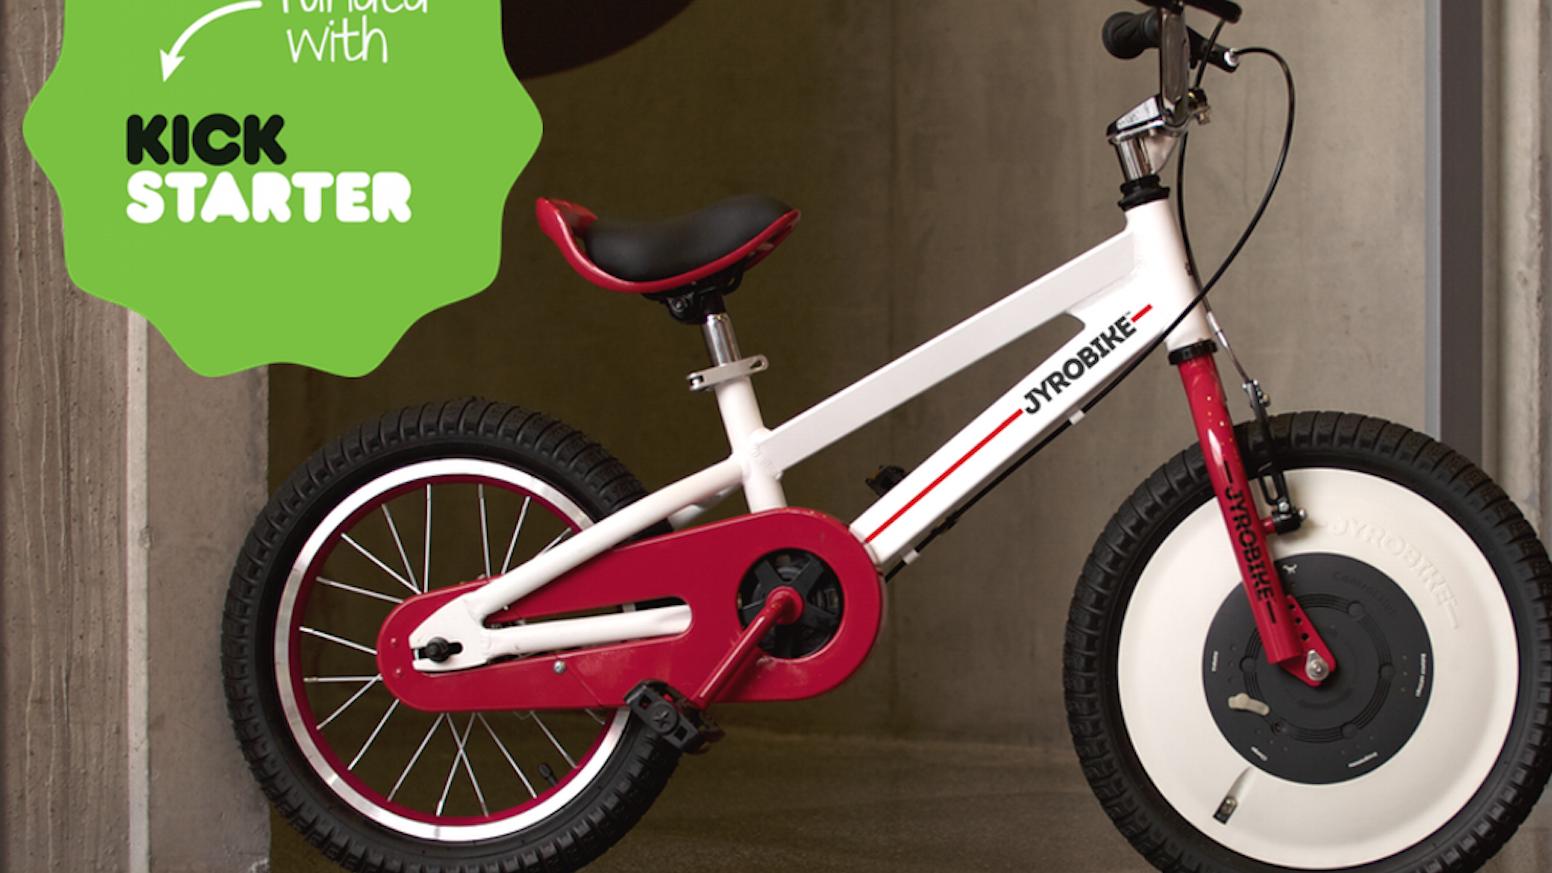 Jyrobike - Auto Balance Bicycle